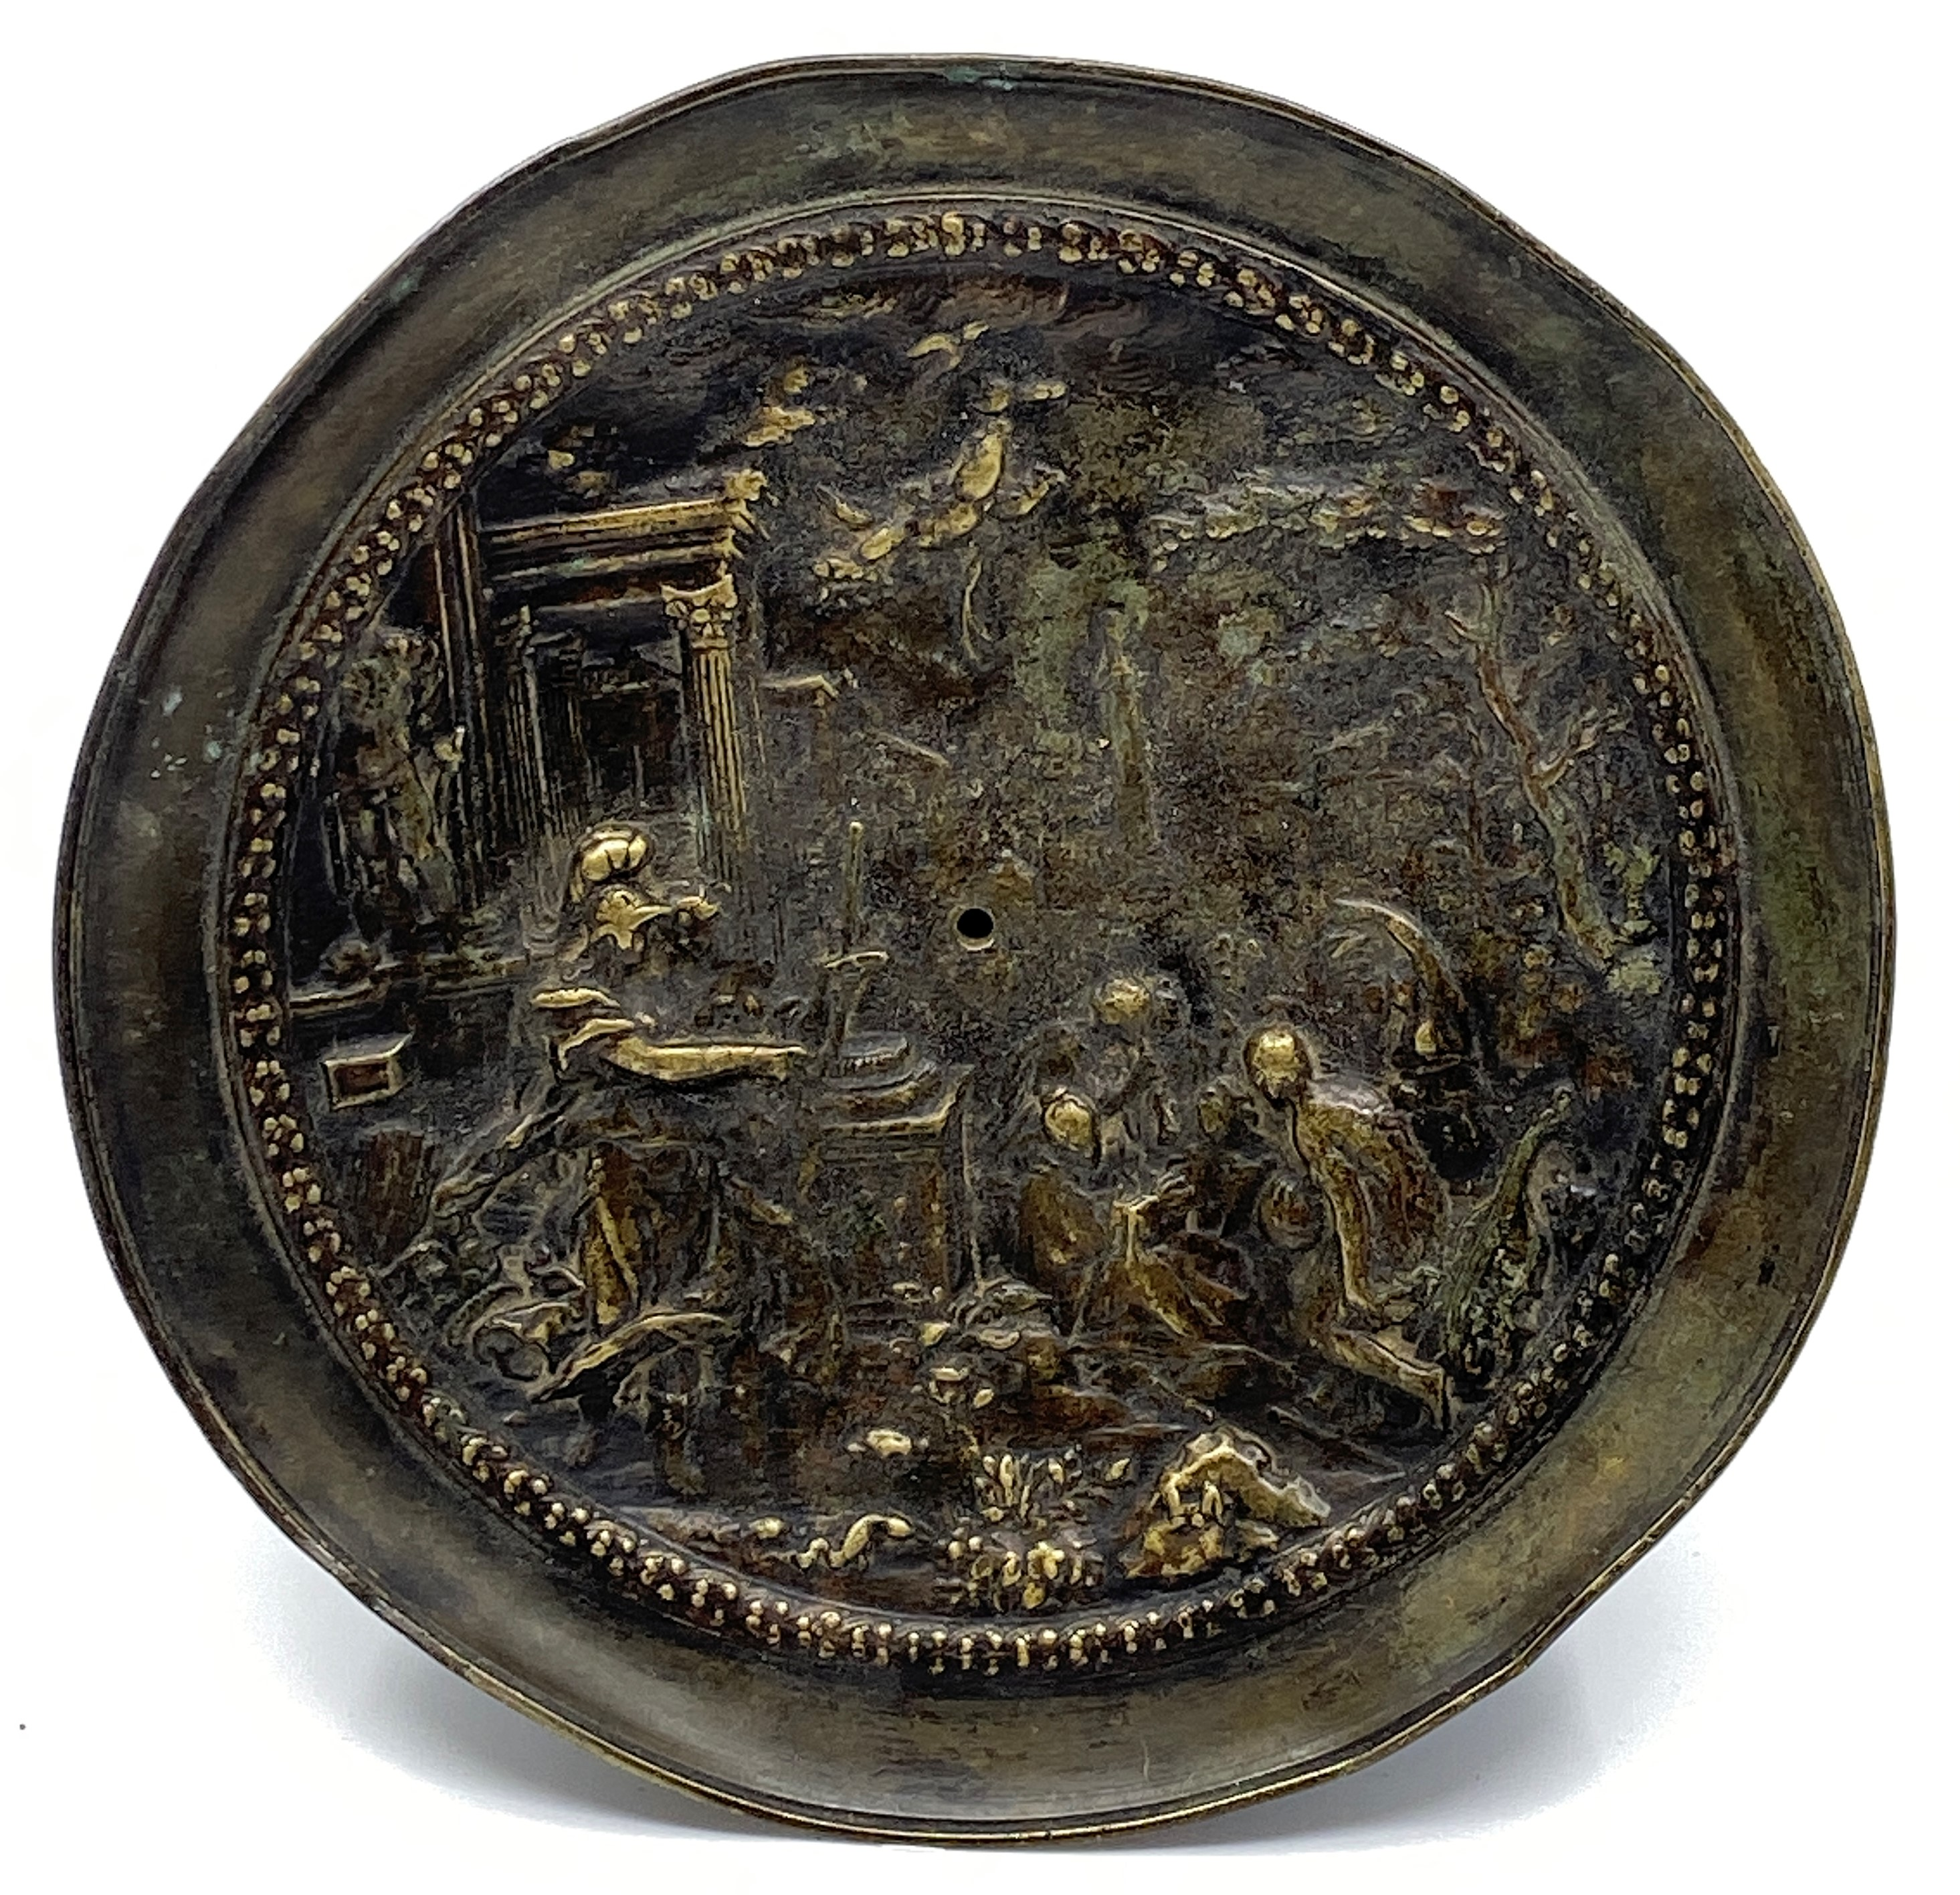 Lot 193 - A circular bronze dish depicting Roman figures amongst pillared buildings and statues (diameter 17.